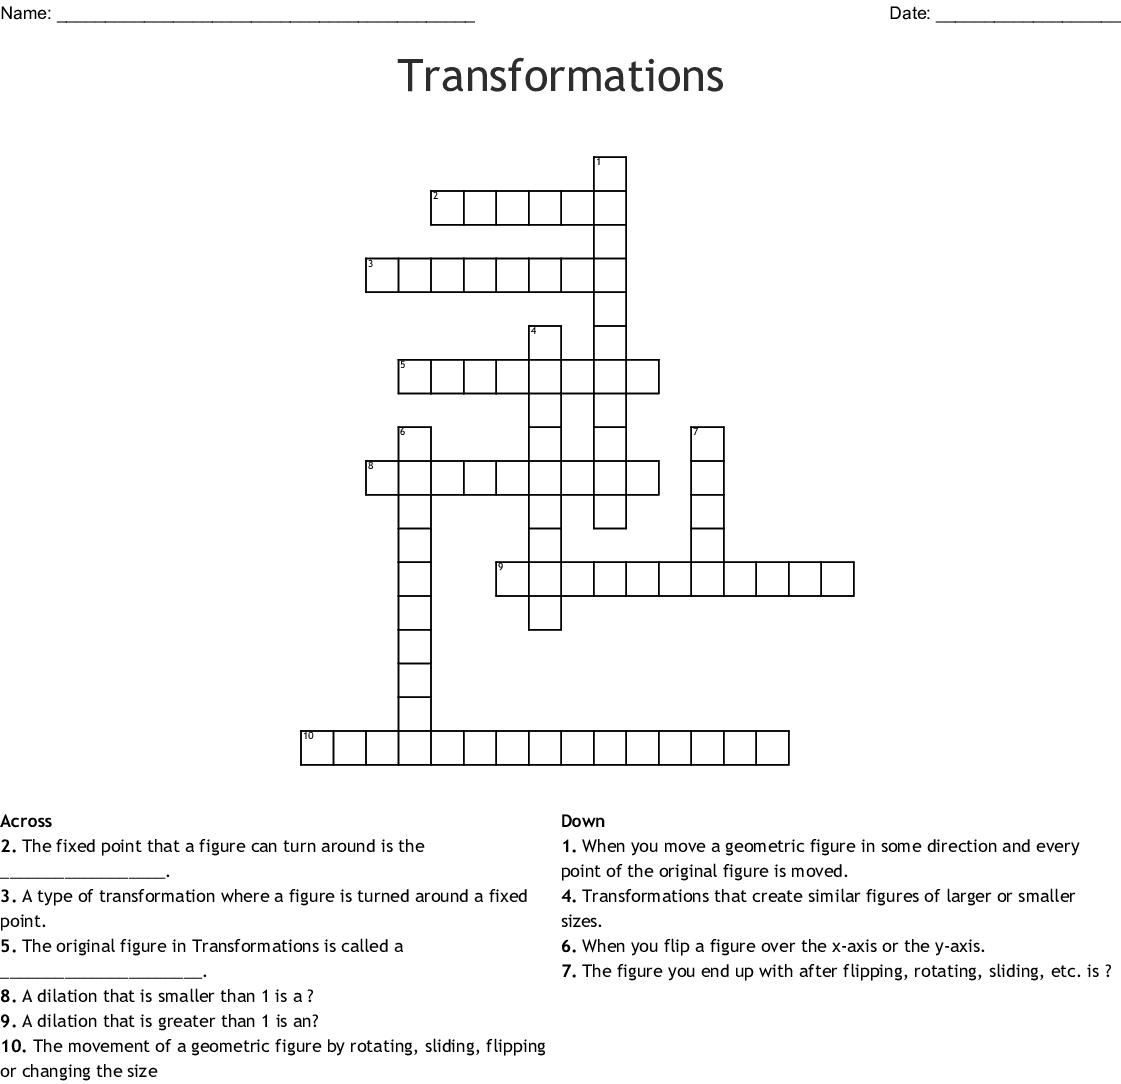 Transformations Crossword Puzzle